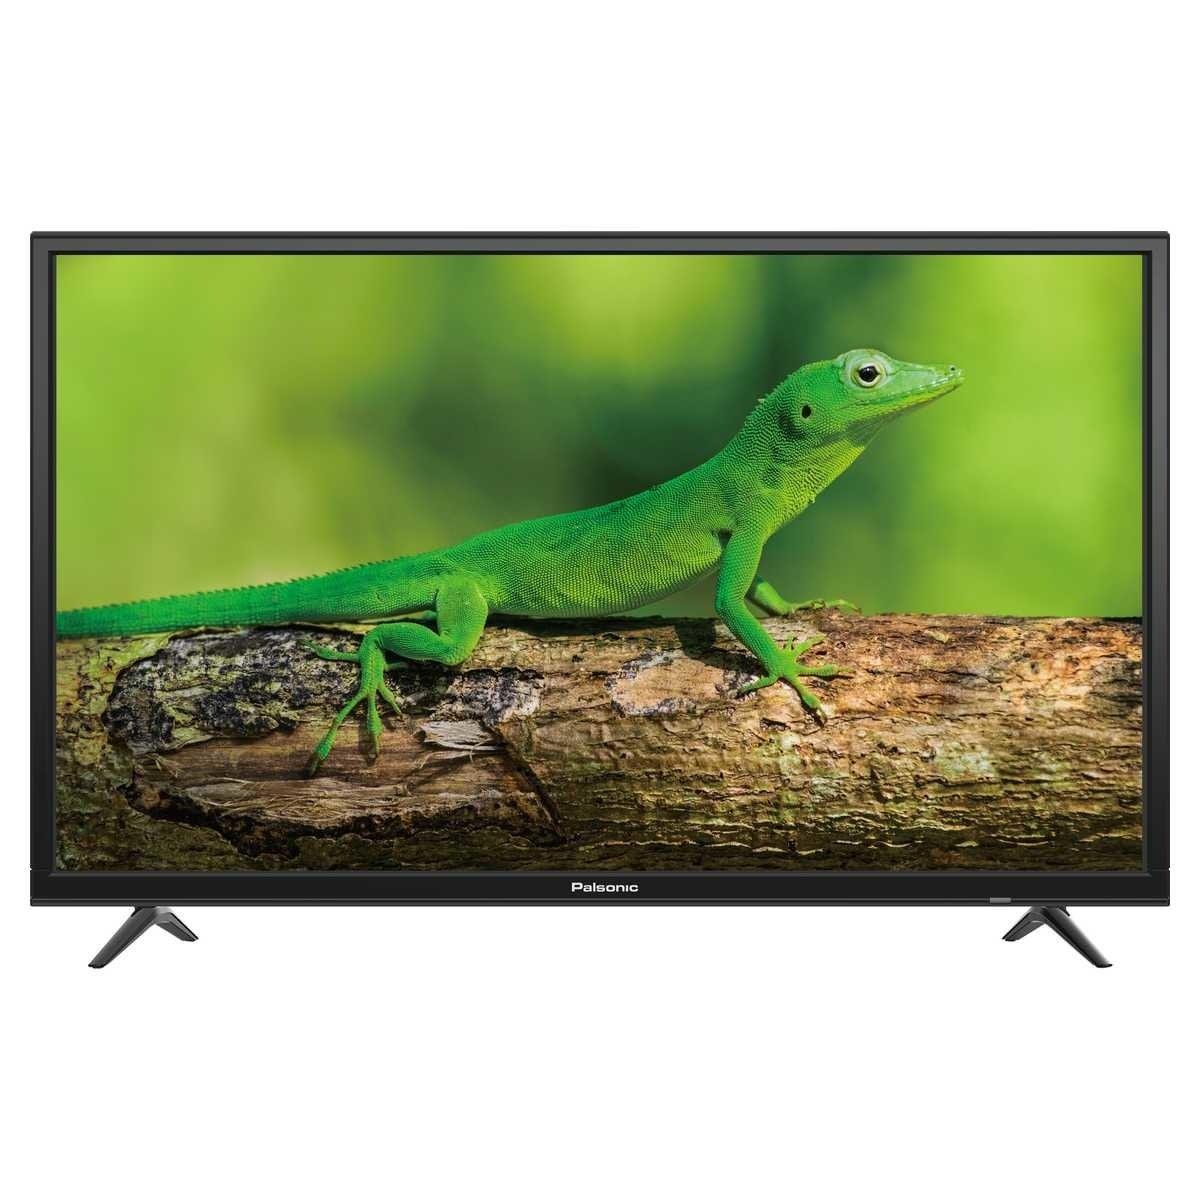 Palsonic PT4315SU 43inch UHD LED LCD TV